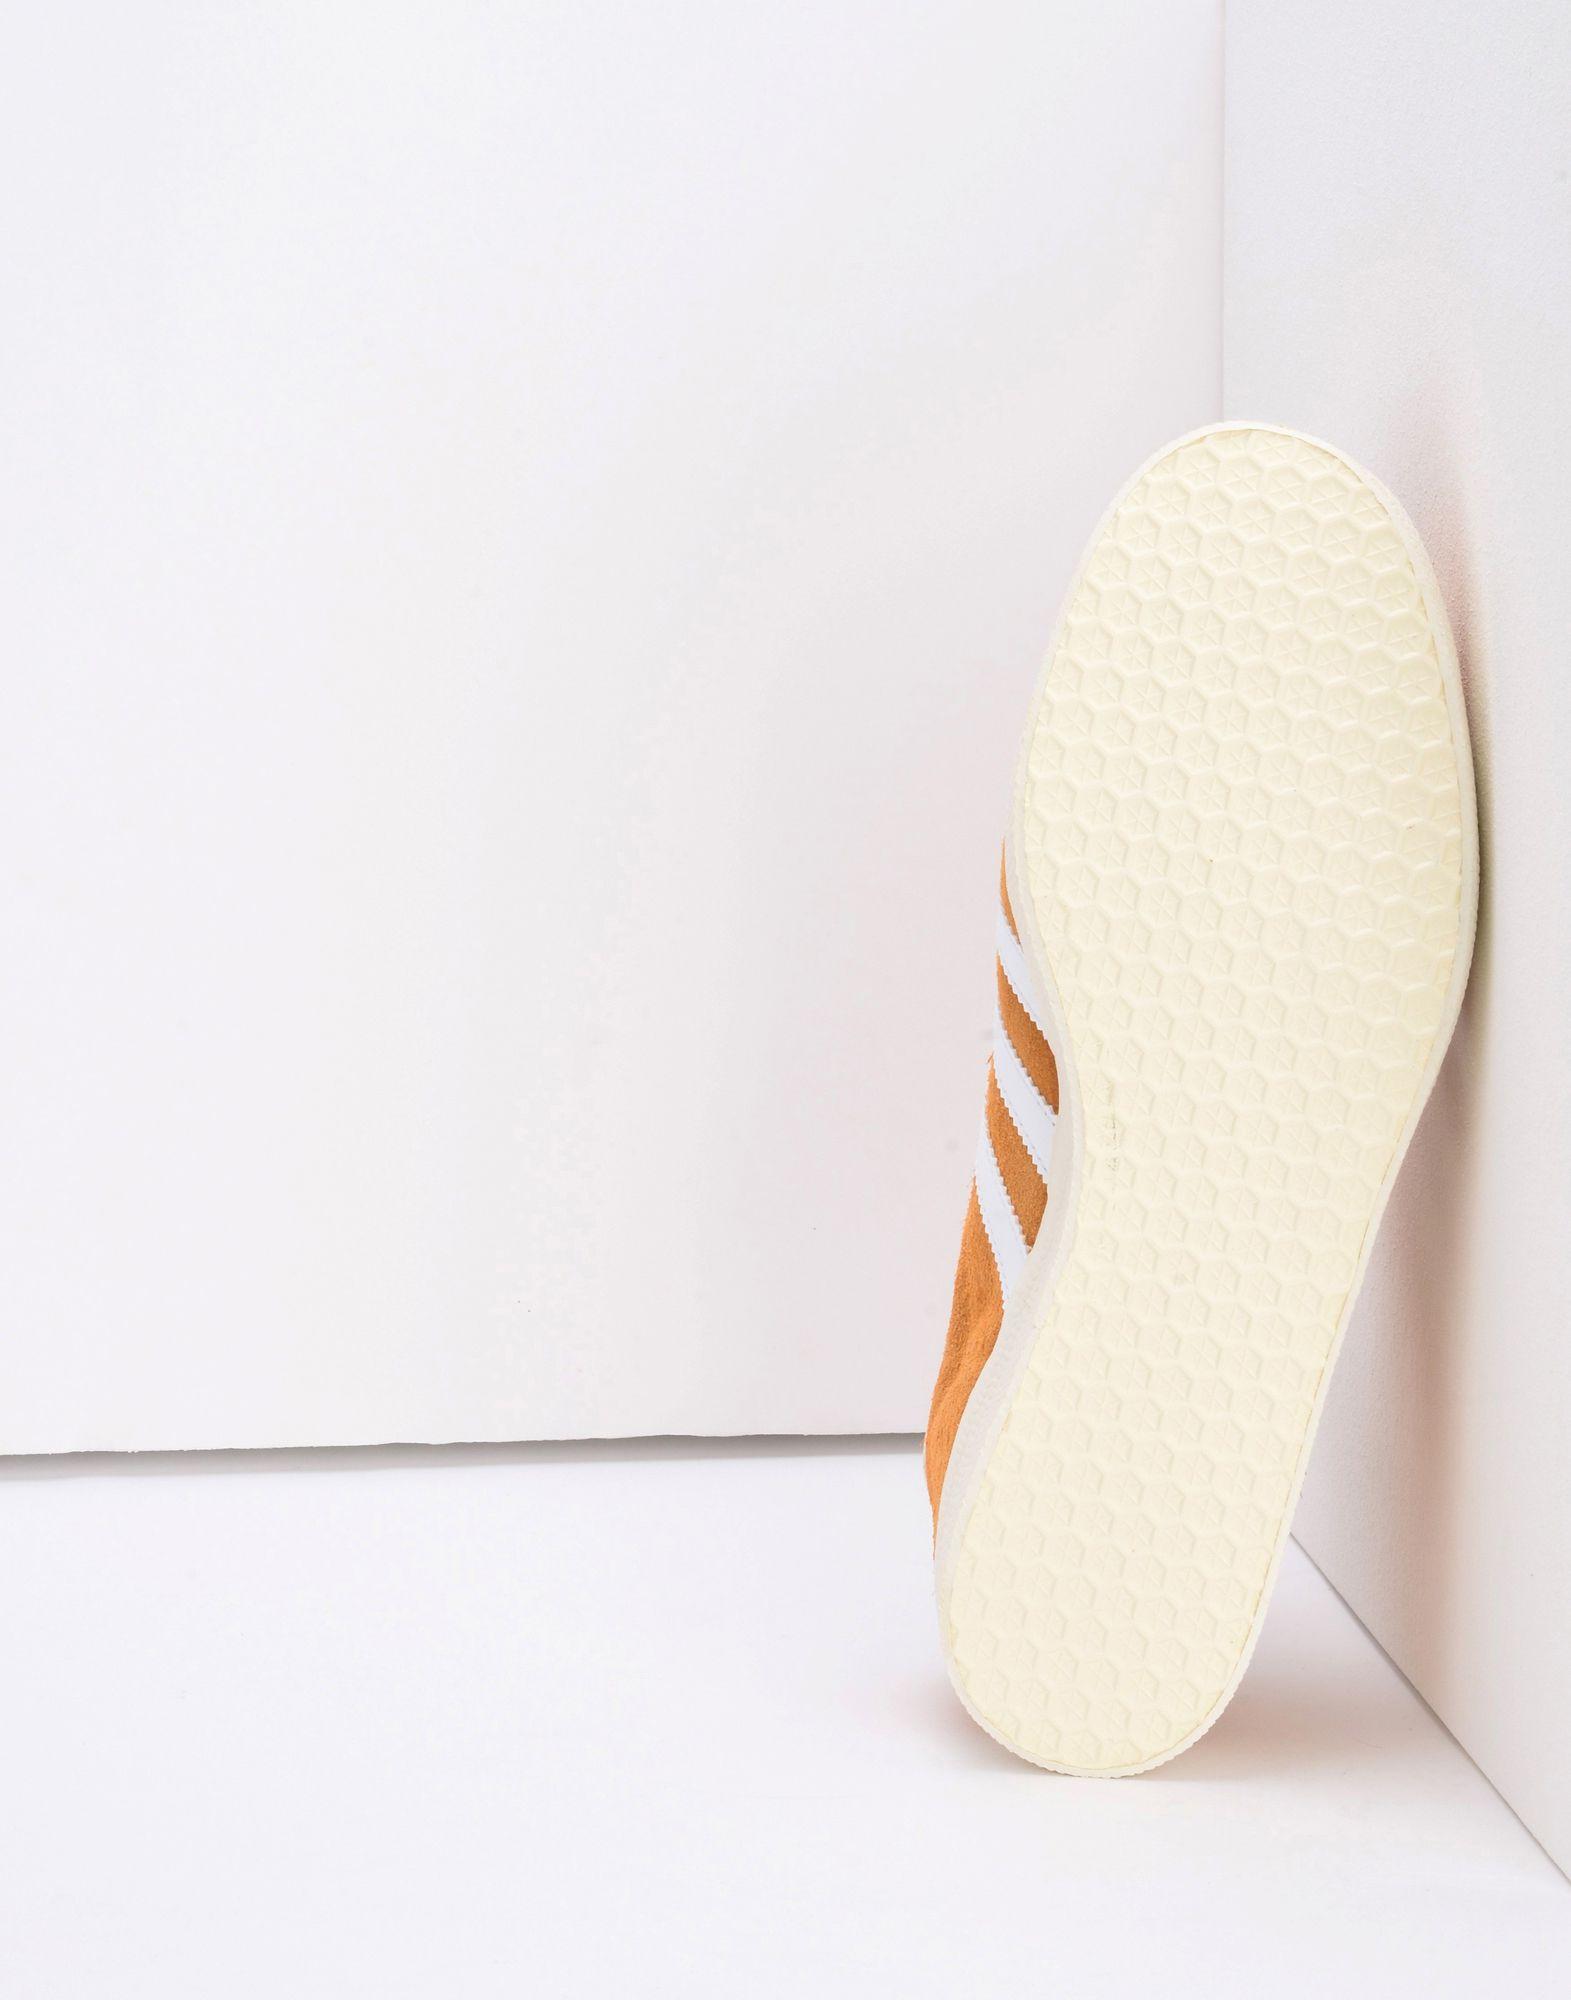 Sneakers Adidas Originals Gazelle - Homme - Sneakers Adidas Originals sur